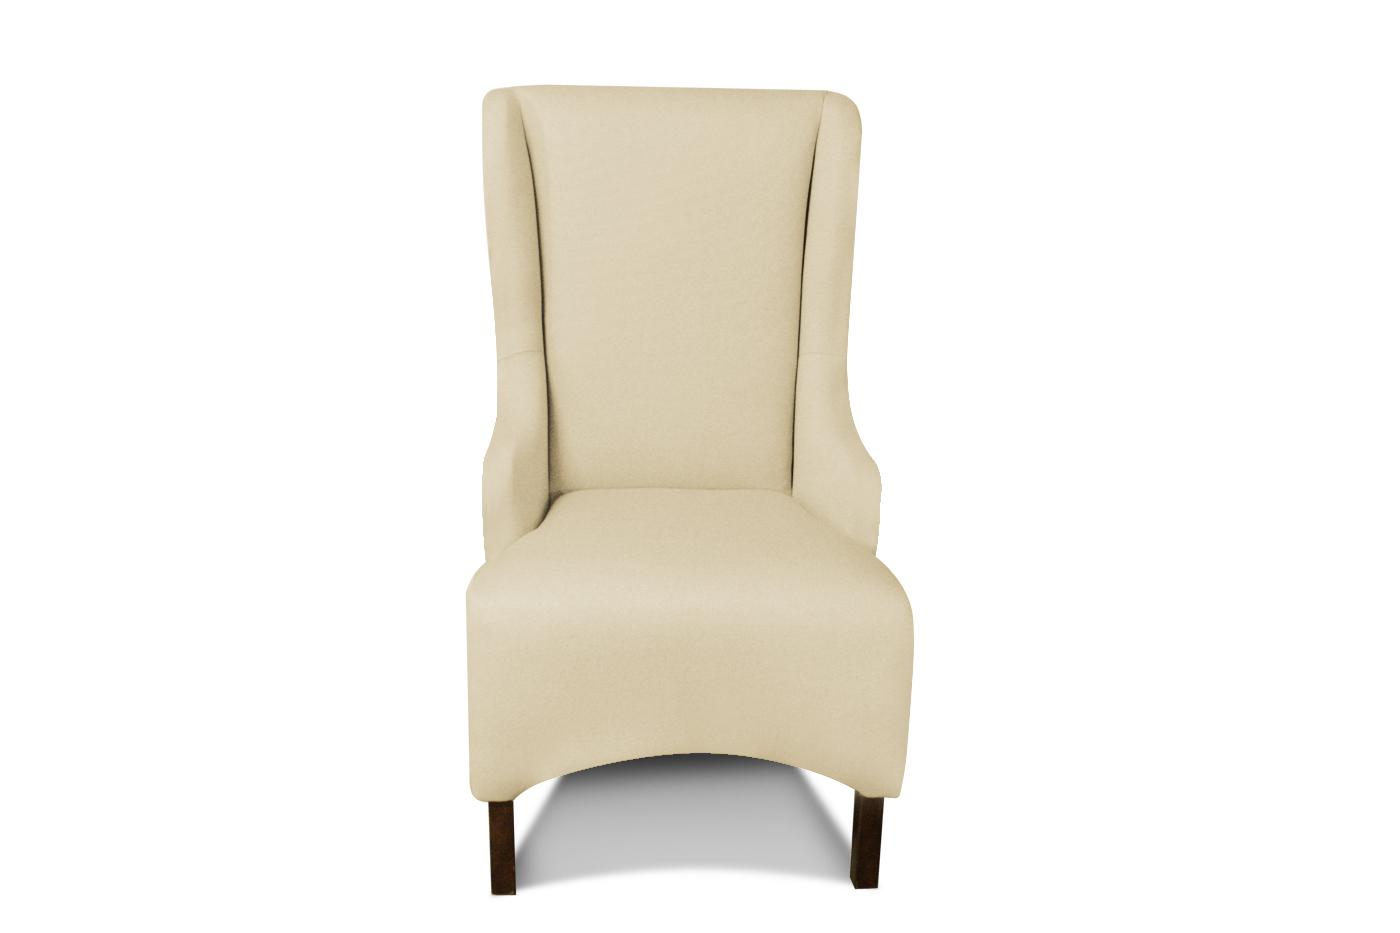 fotele fabio emebletapicerowane producent